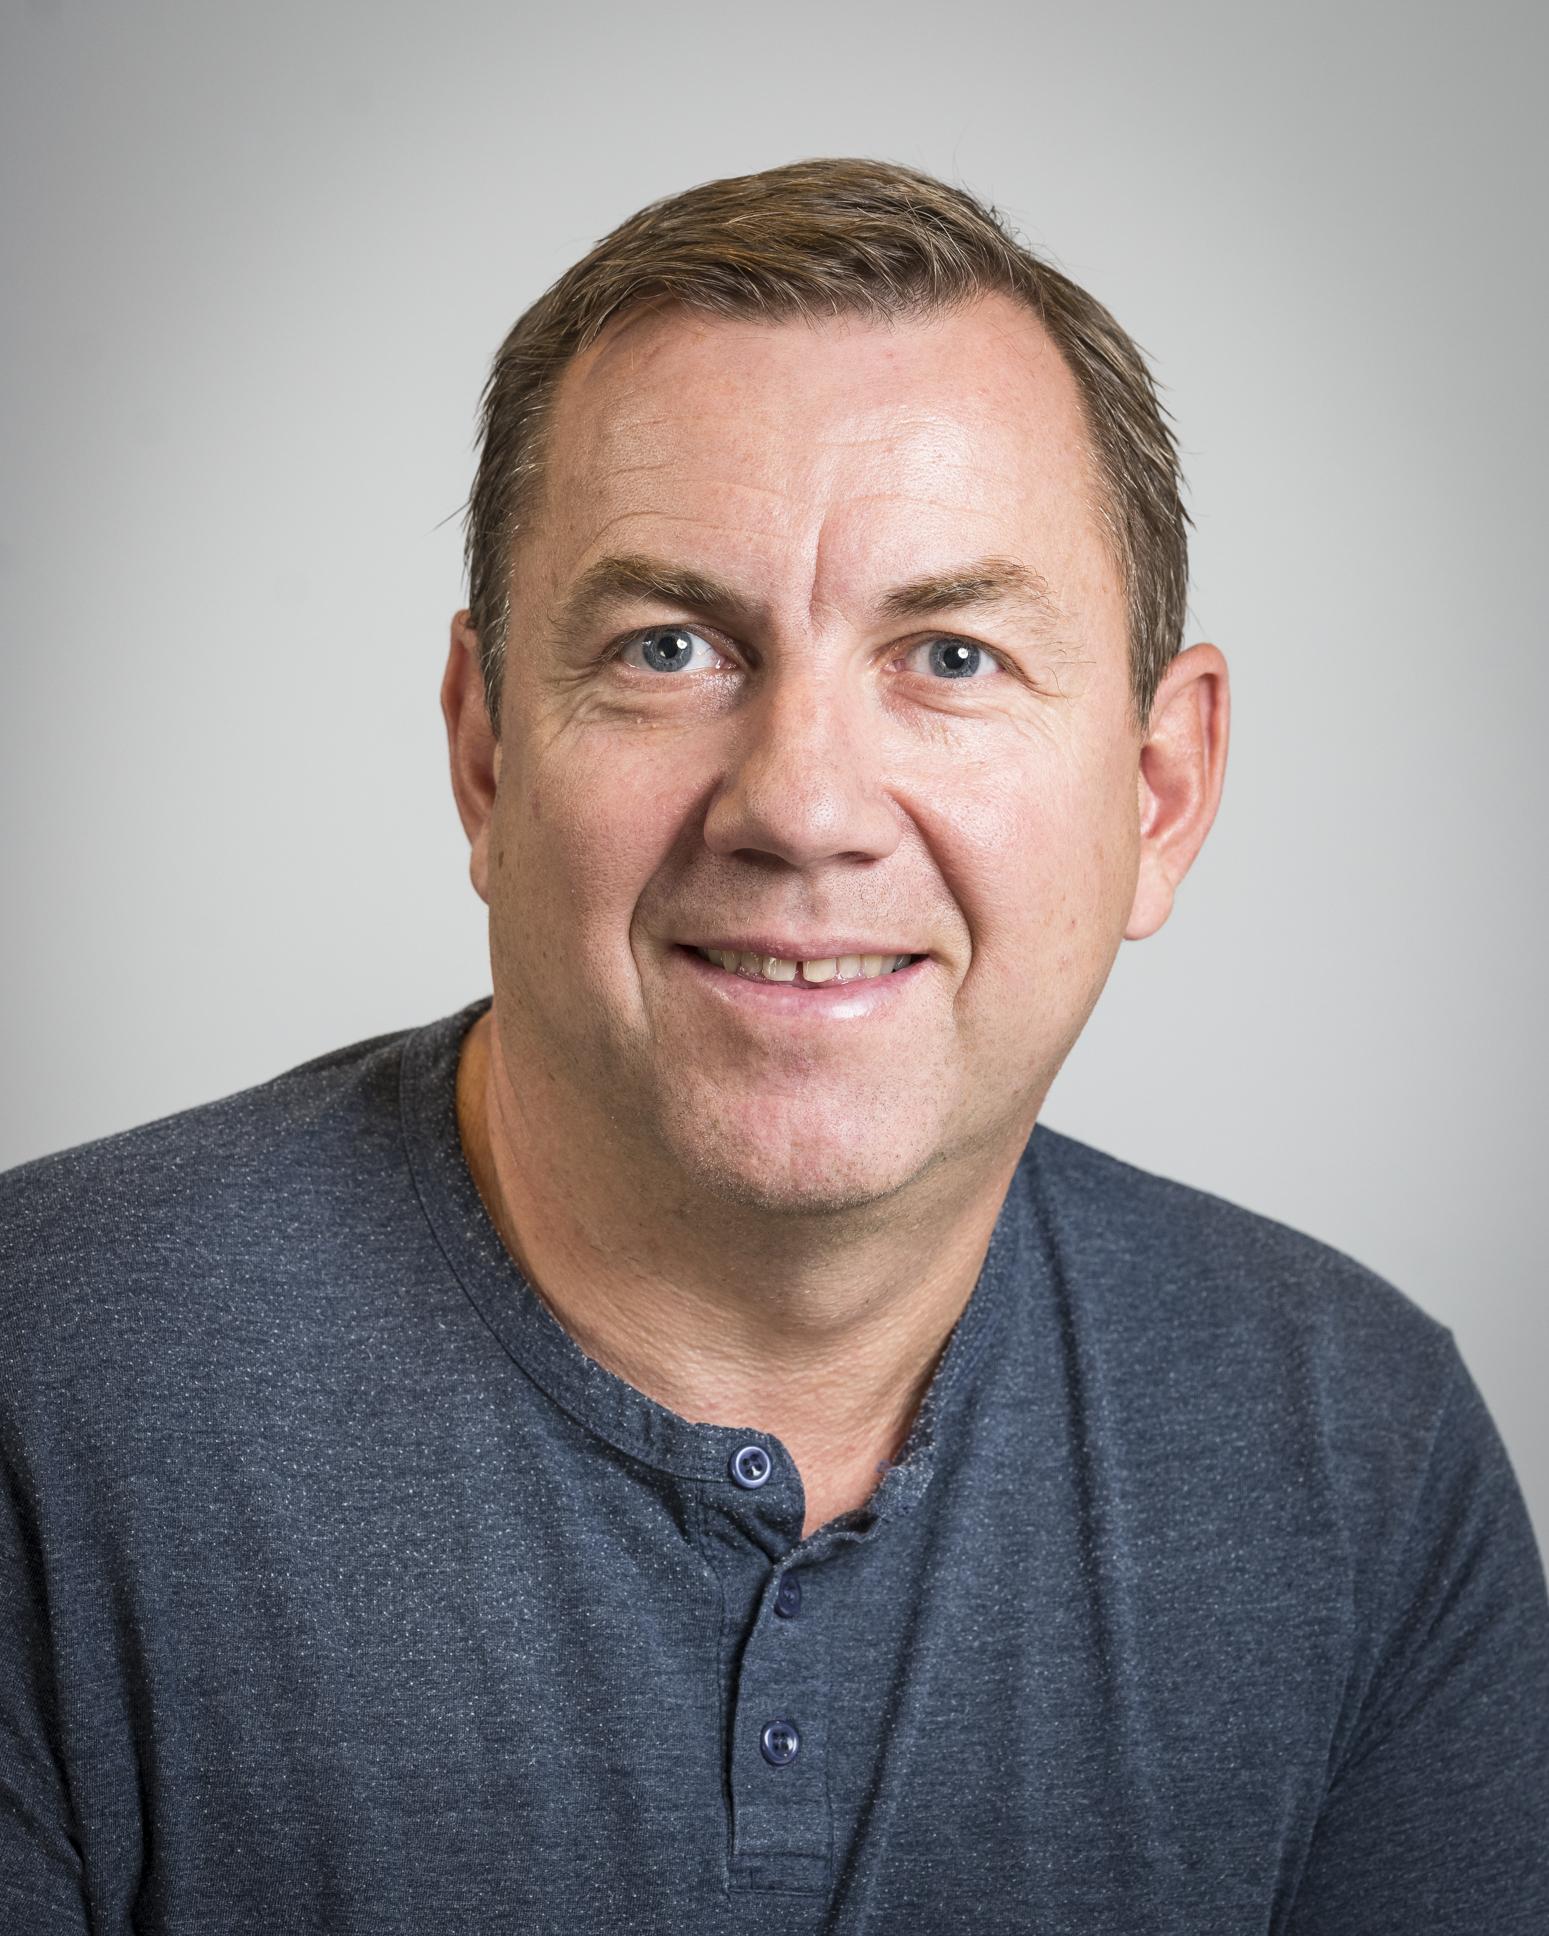 Erik Wikebyg's photo